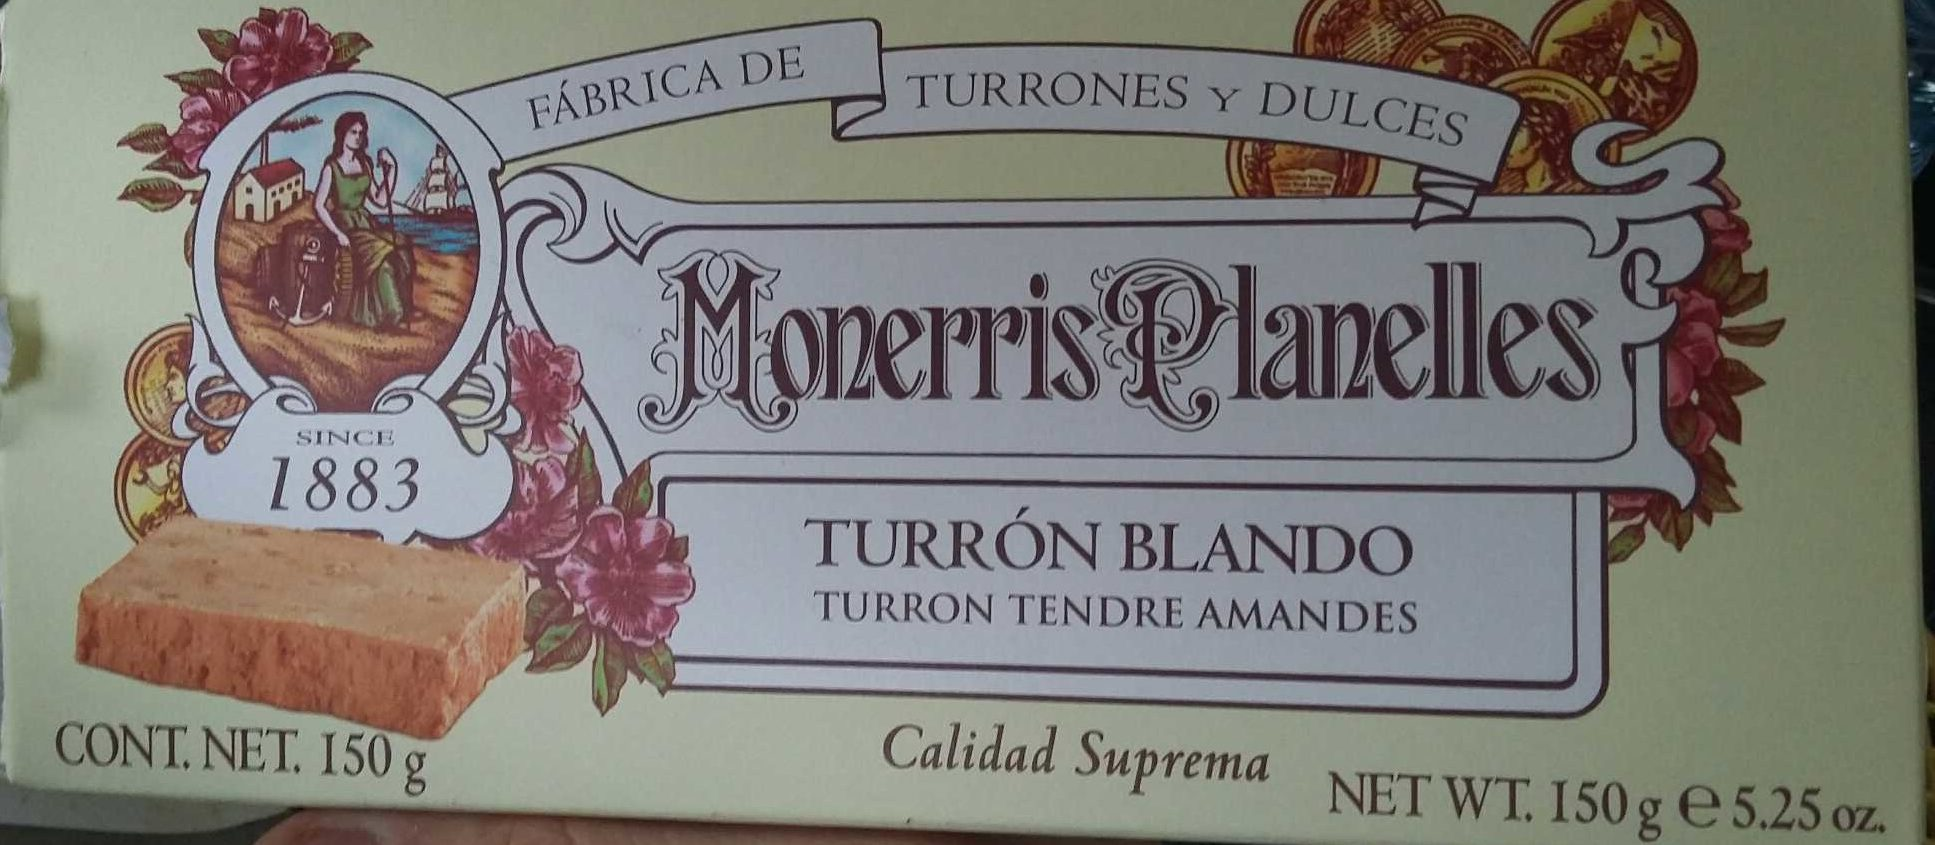 Turron Blando, tendre amandes - Producto - fr